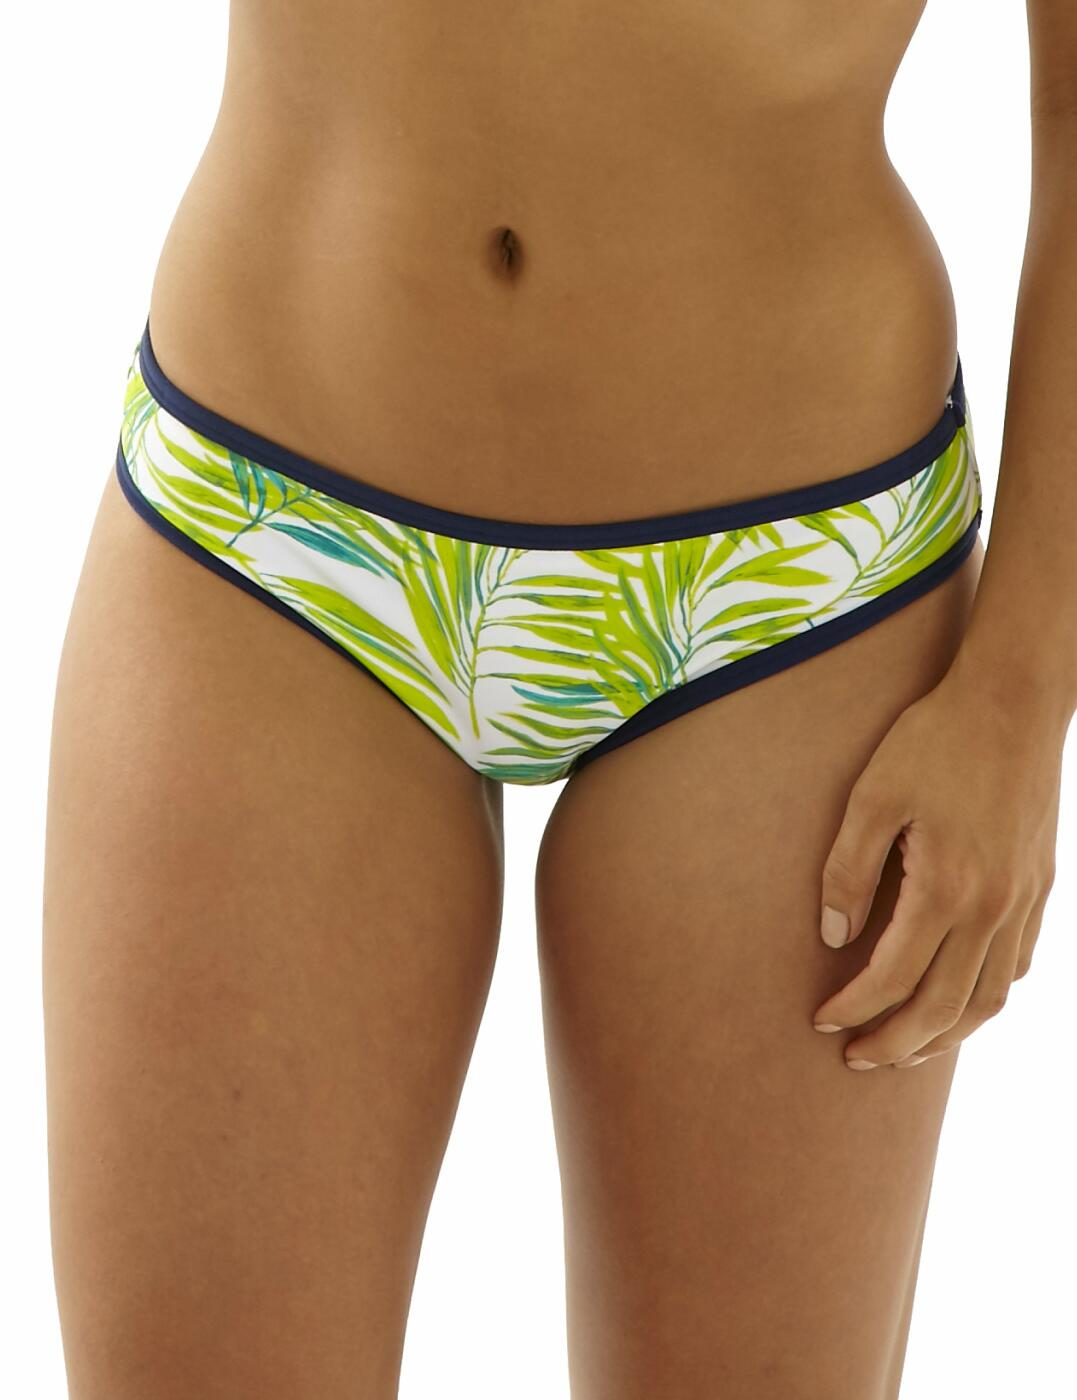 CW0229 Cleo Avril Classic Bikini Brief - CW0229 Palm Print